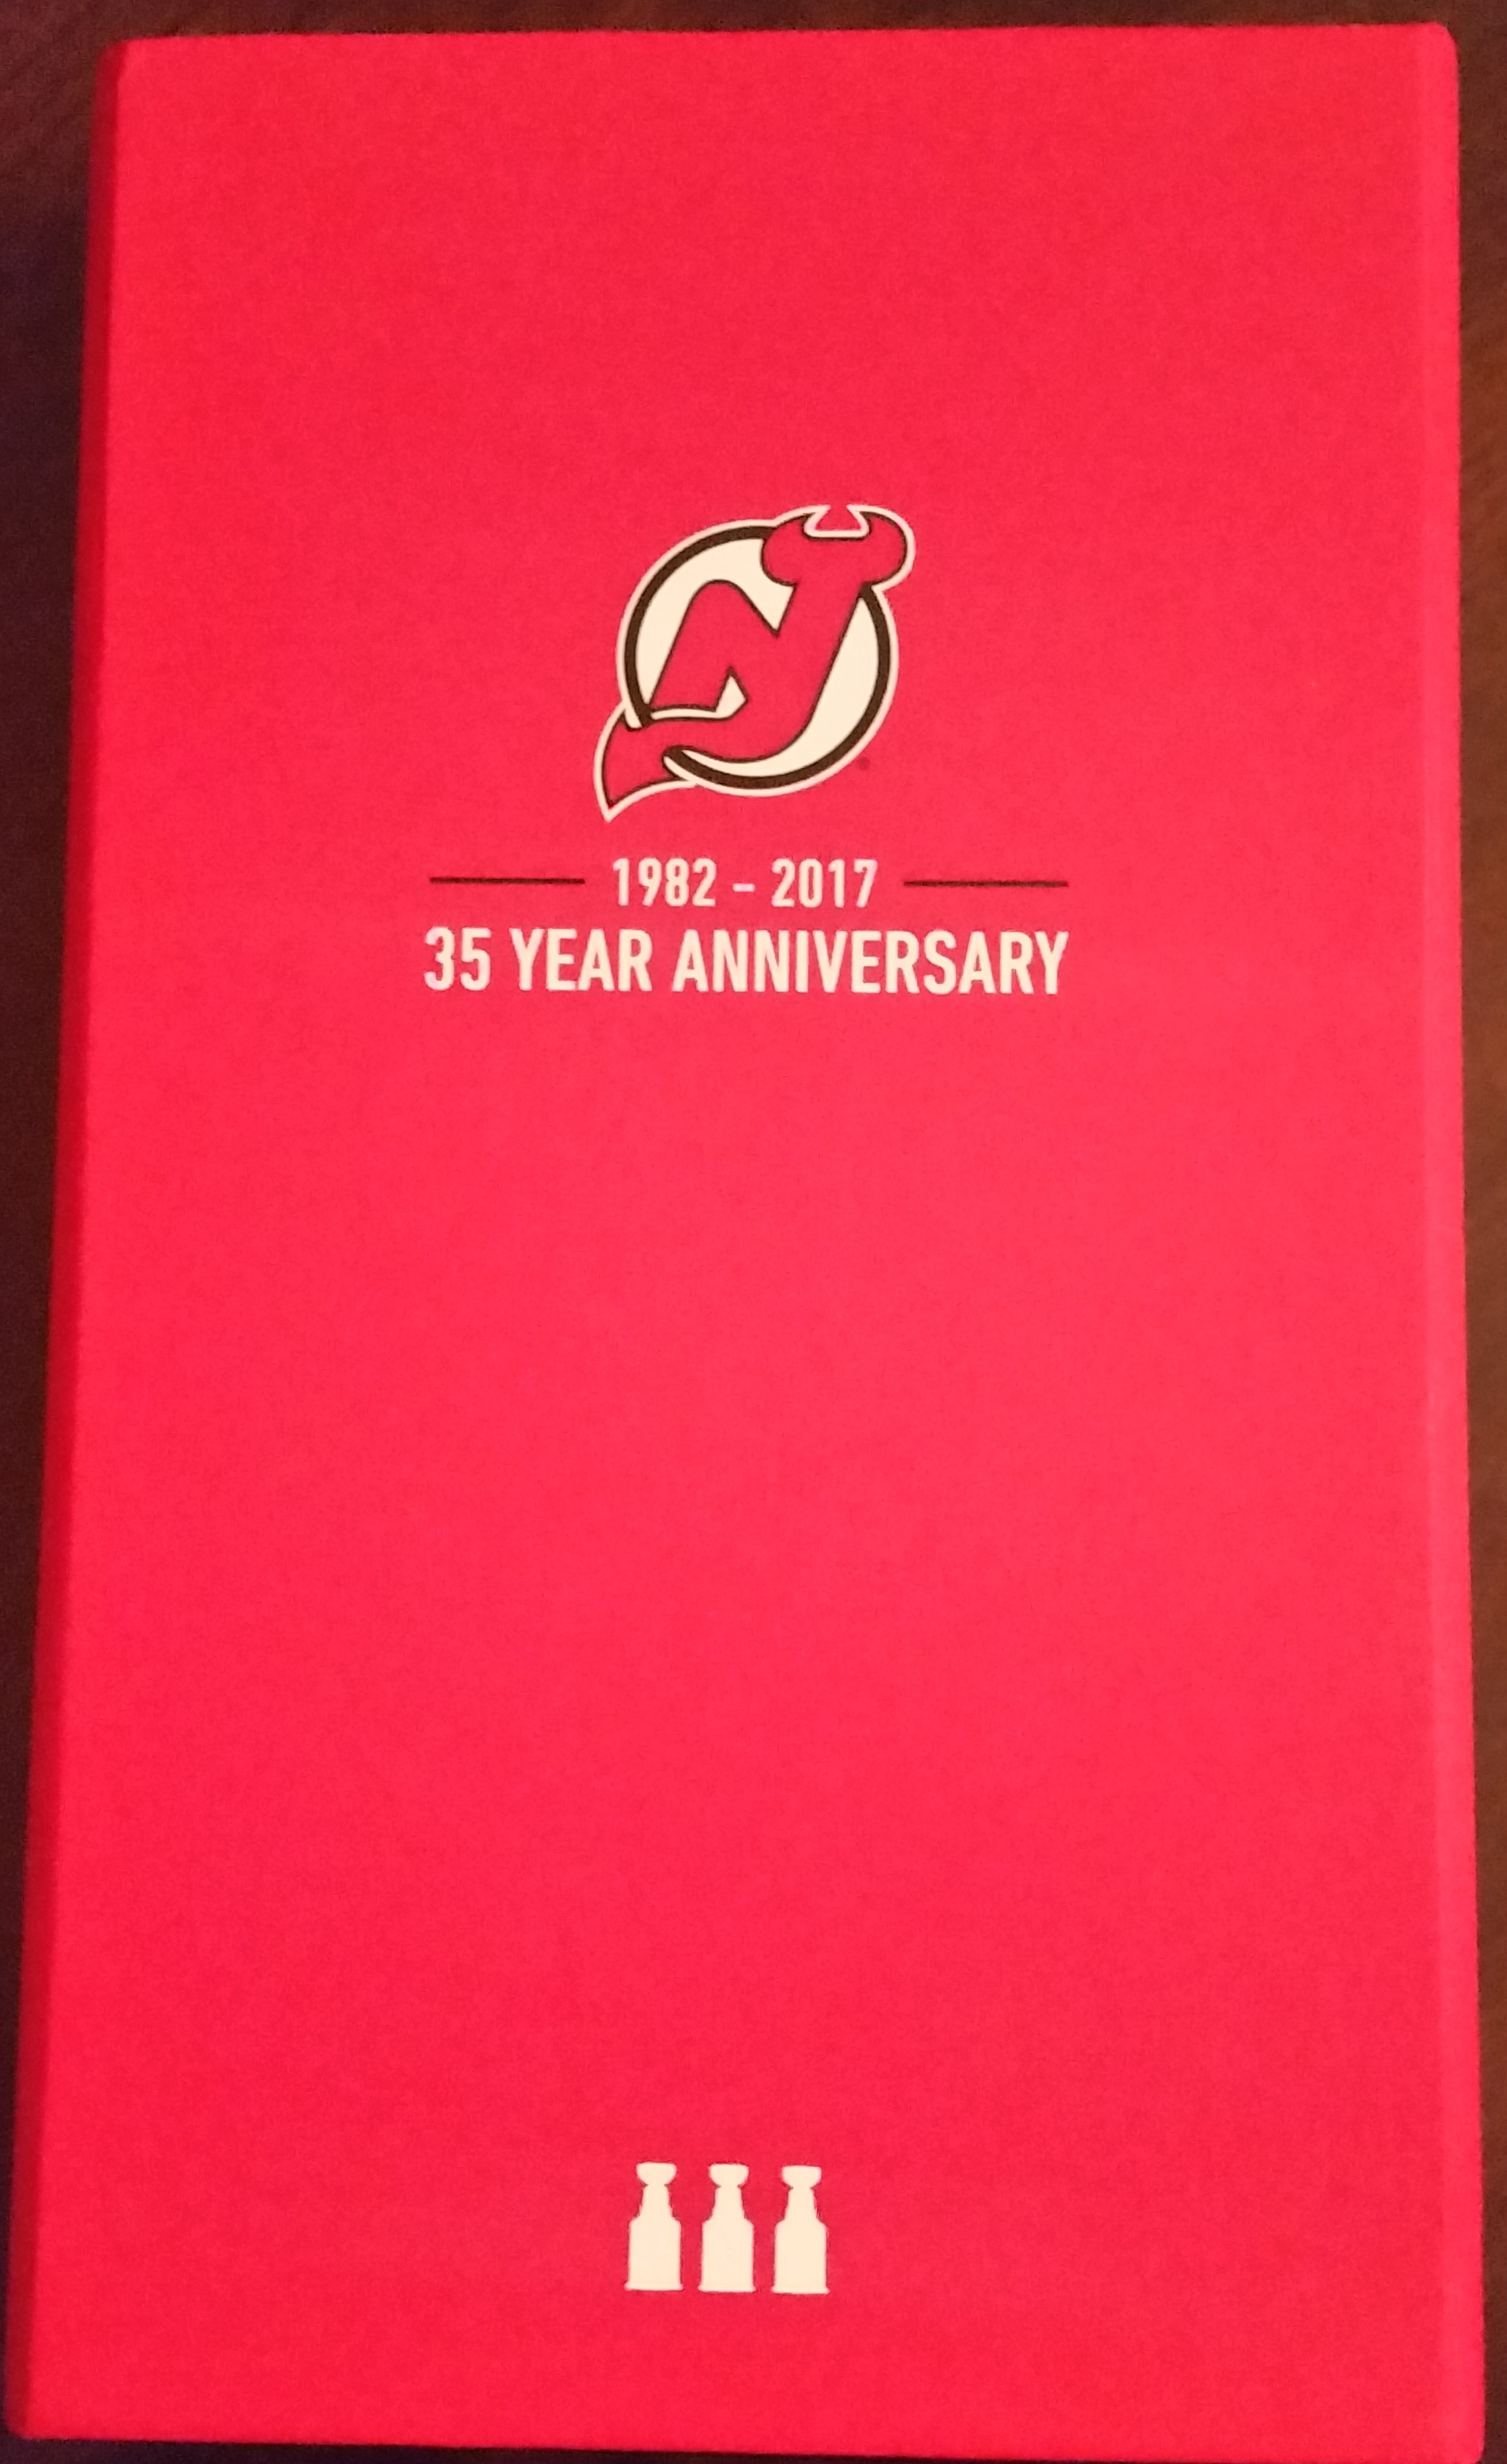 The 2017-18 Devils season ticket box